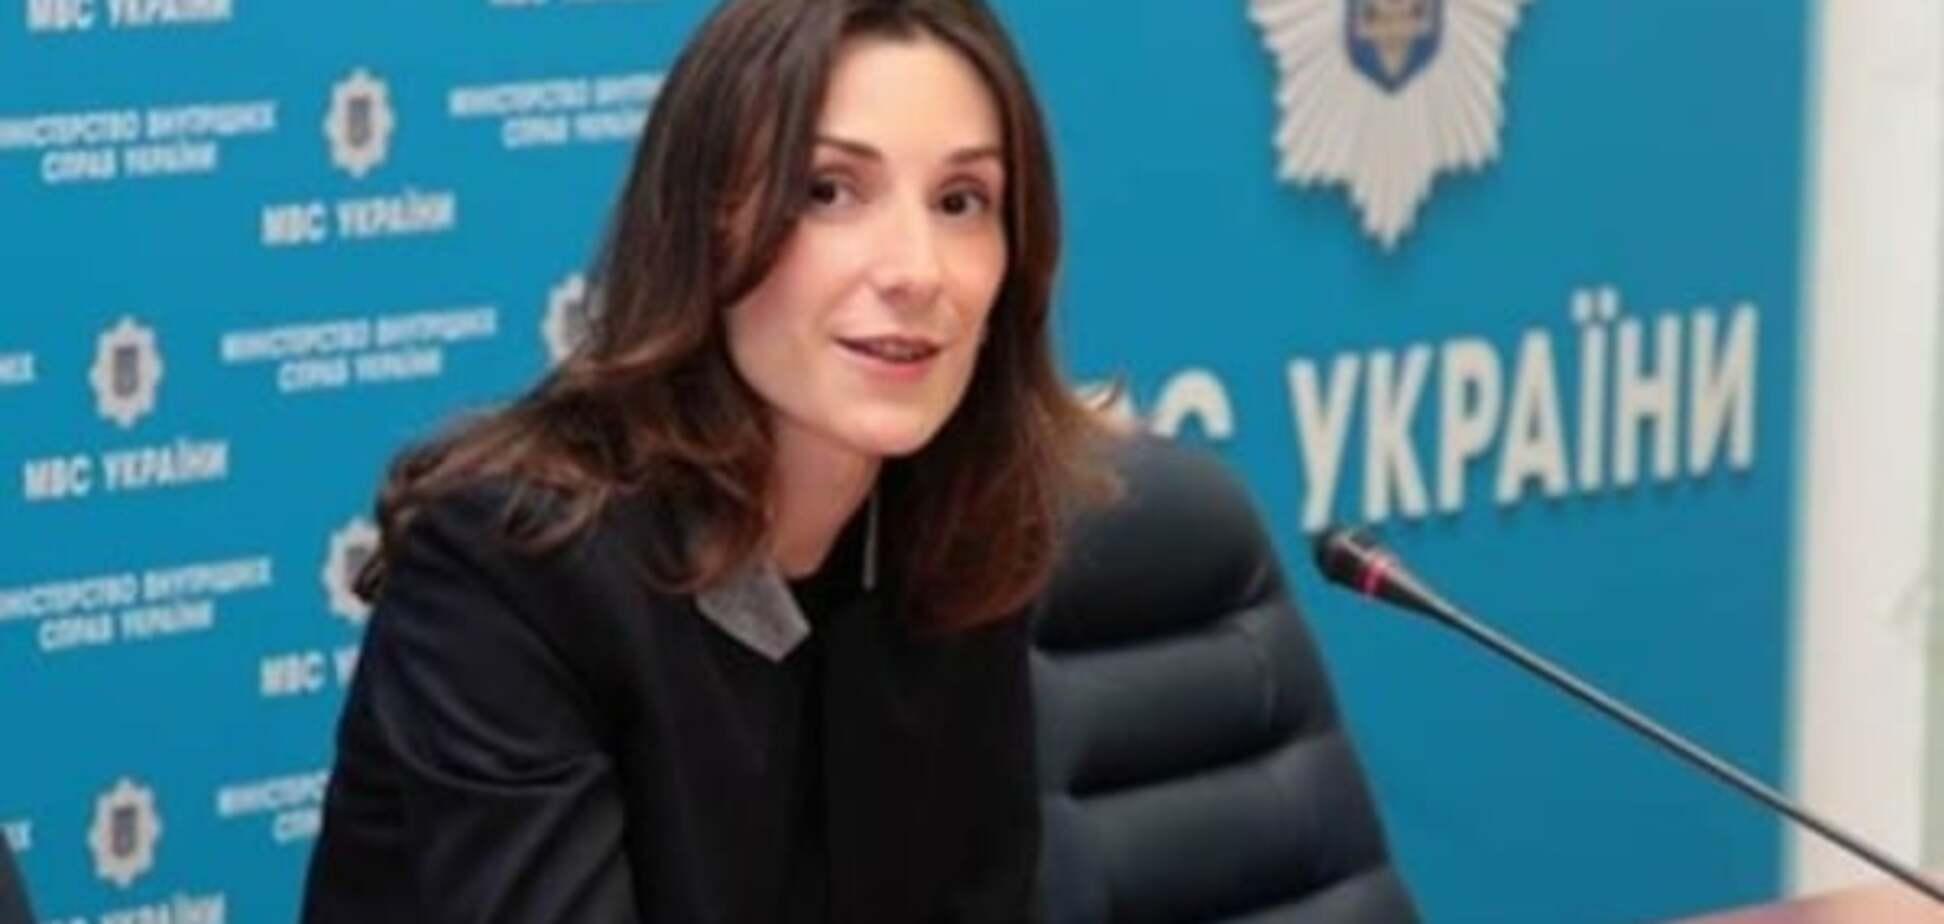 Згуладзе и 140 млн евро: Геращенко рассказал о 'задержании' зама Авакова